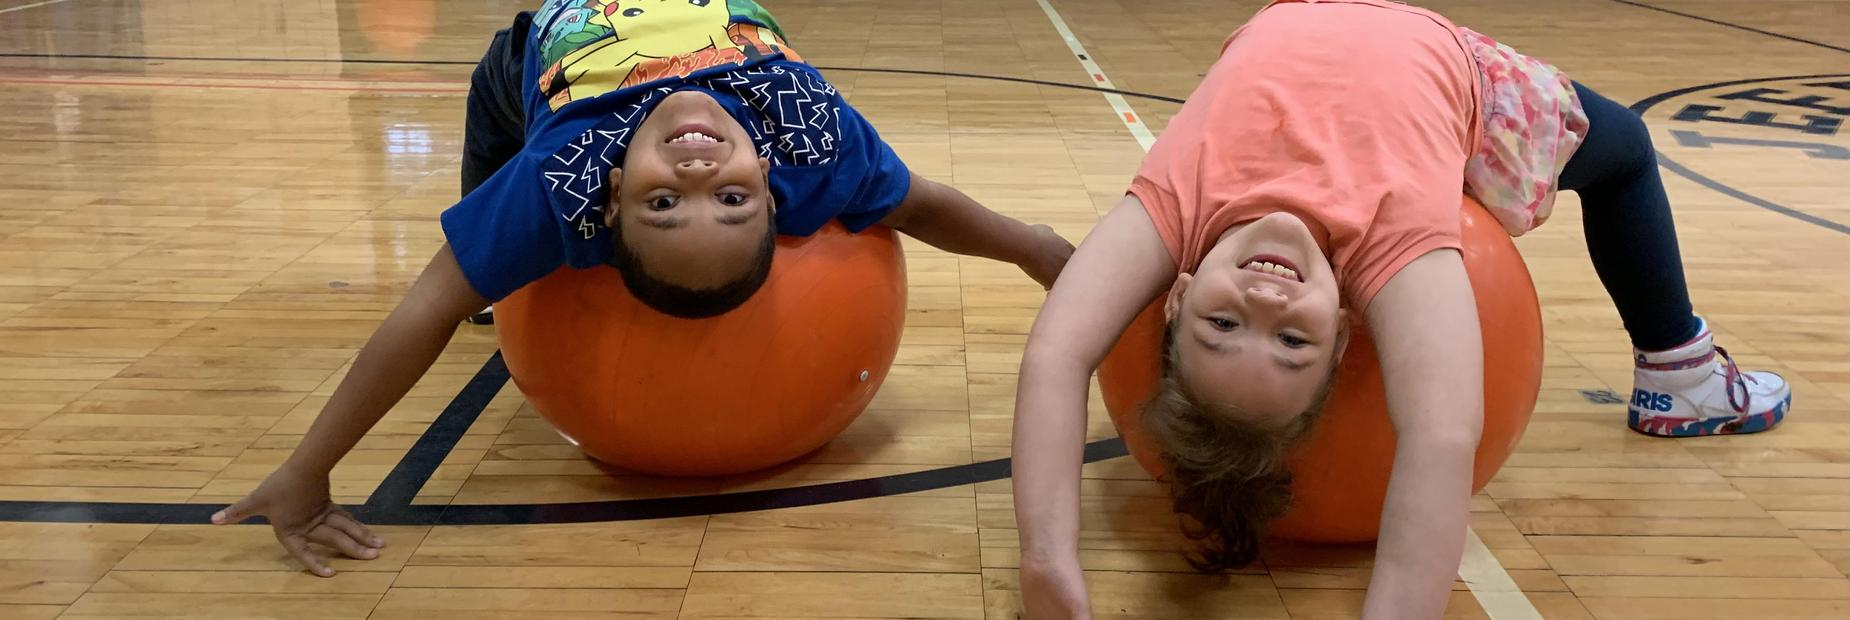 Students enjoying PE class with Mrs. Hempton.